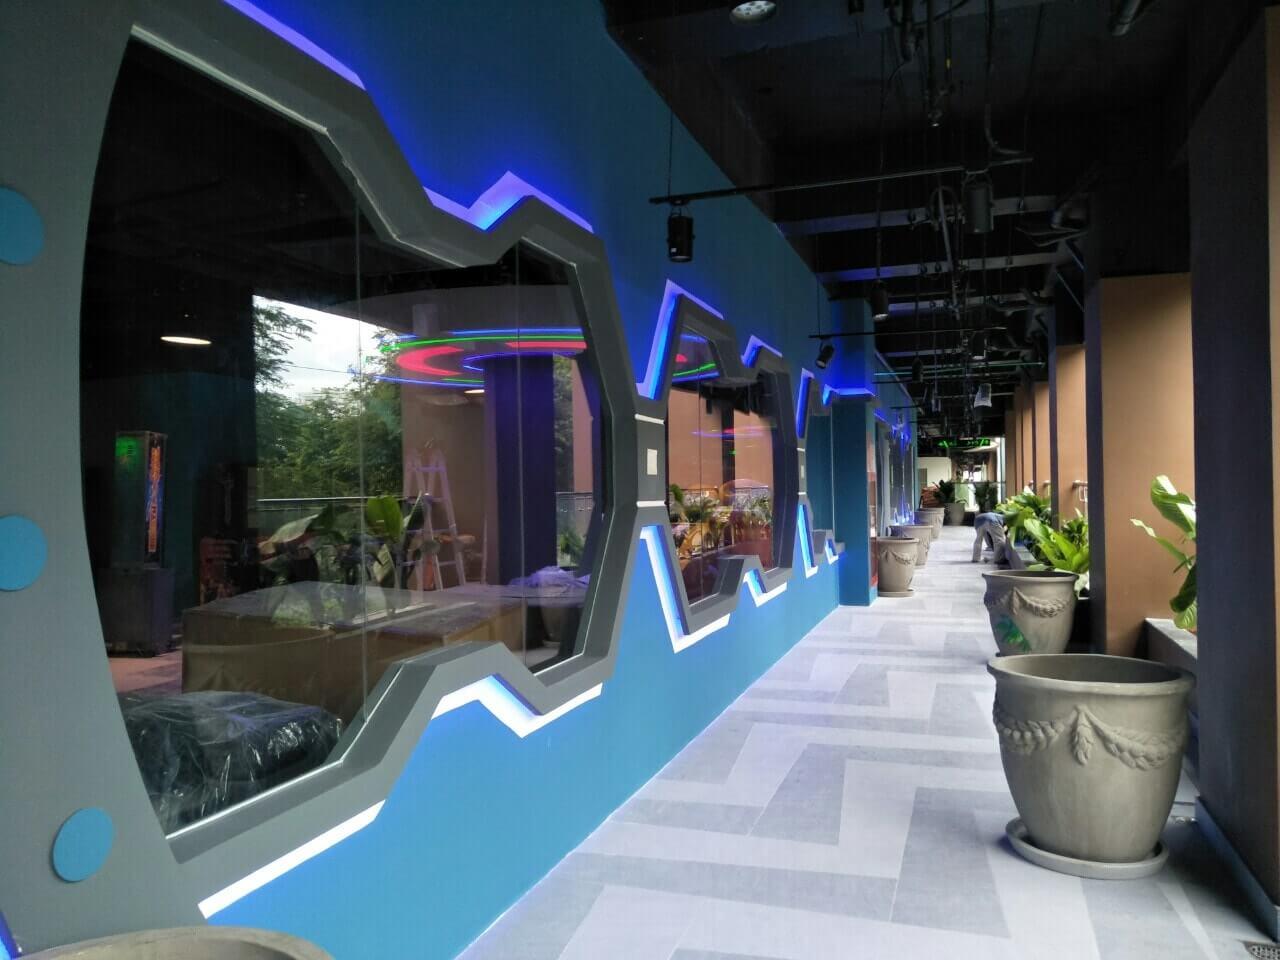 GOADESIGN Thiết Kế Khu Vui Chơi Garden Mall - Q5 (16)